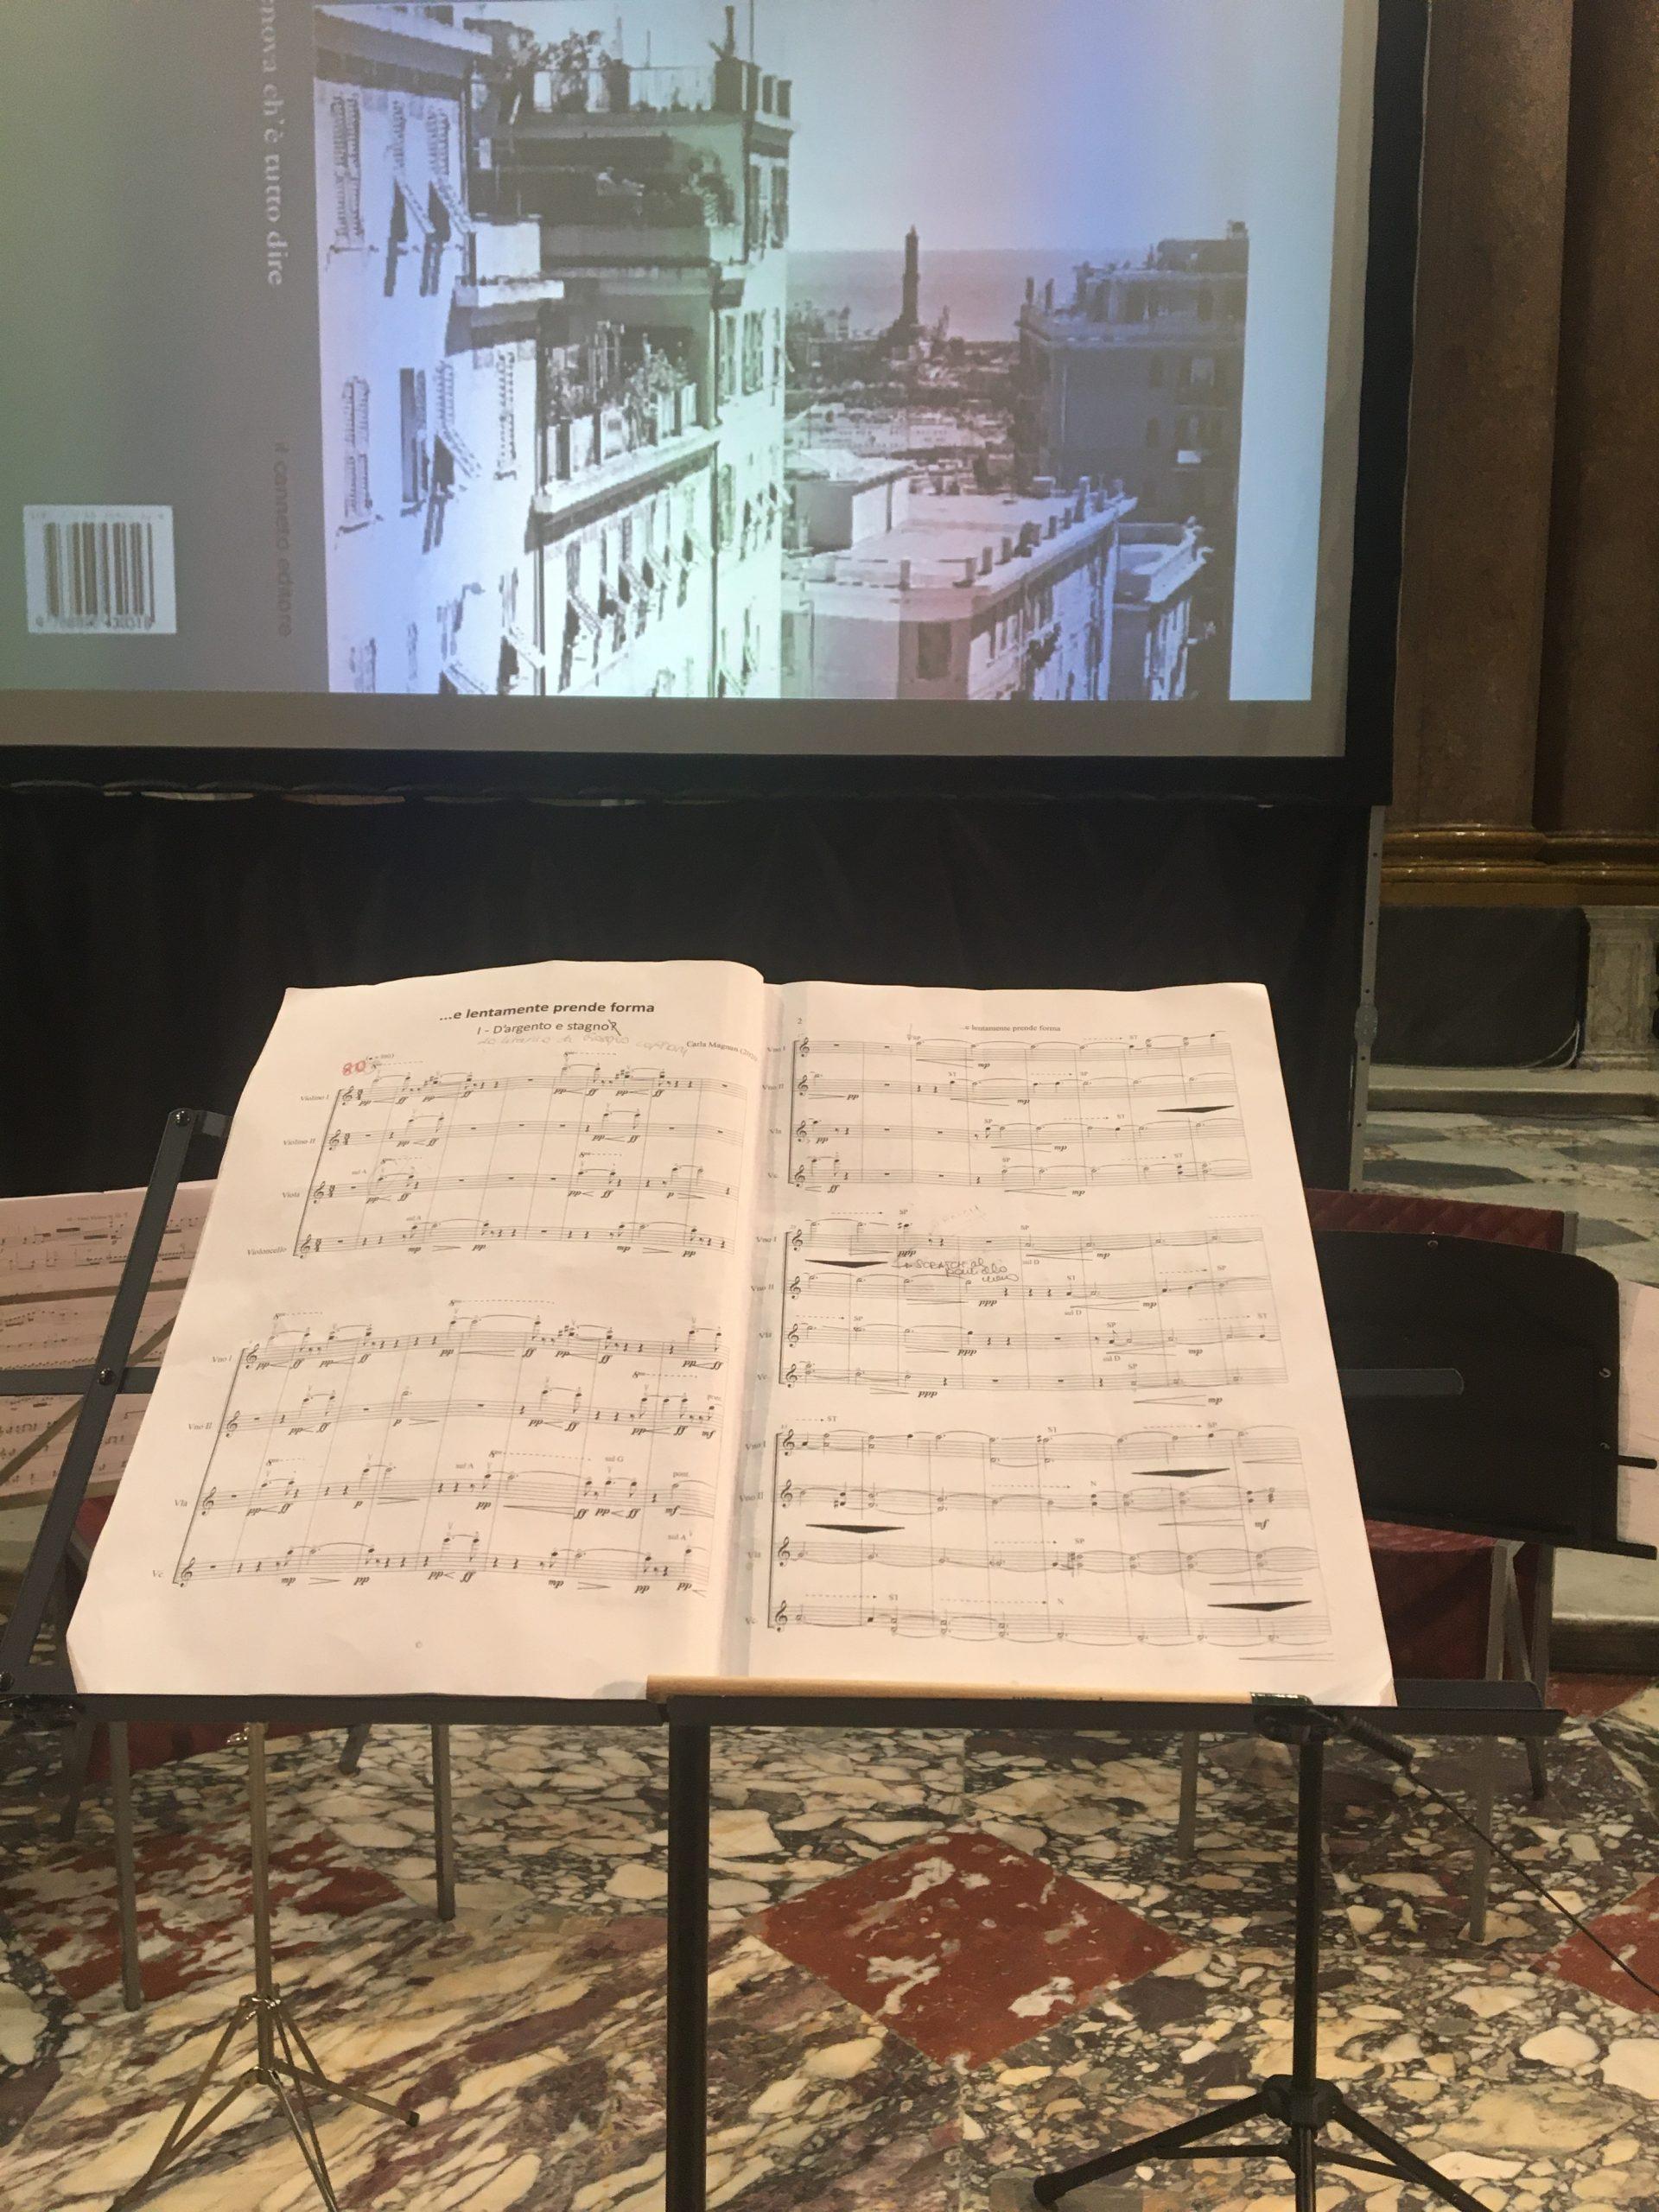 "©première my work ""e lentamente prende forma"", for string quartet, Palazzo Ducale, Genova, 2020"